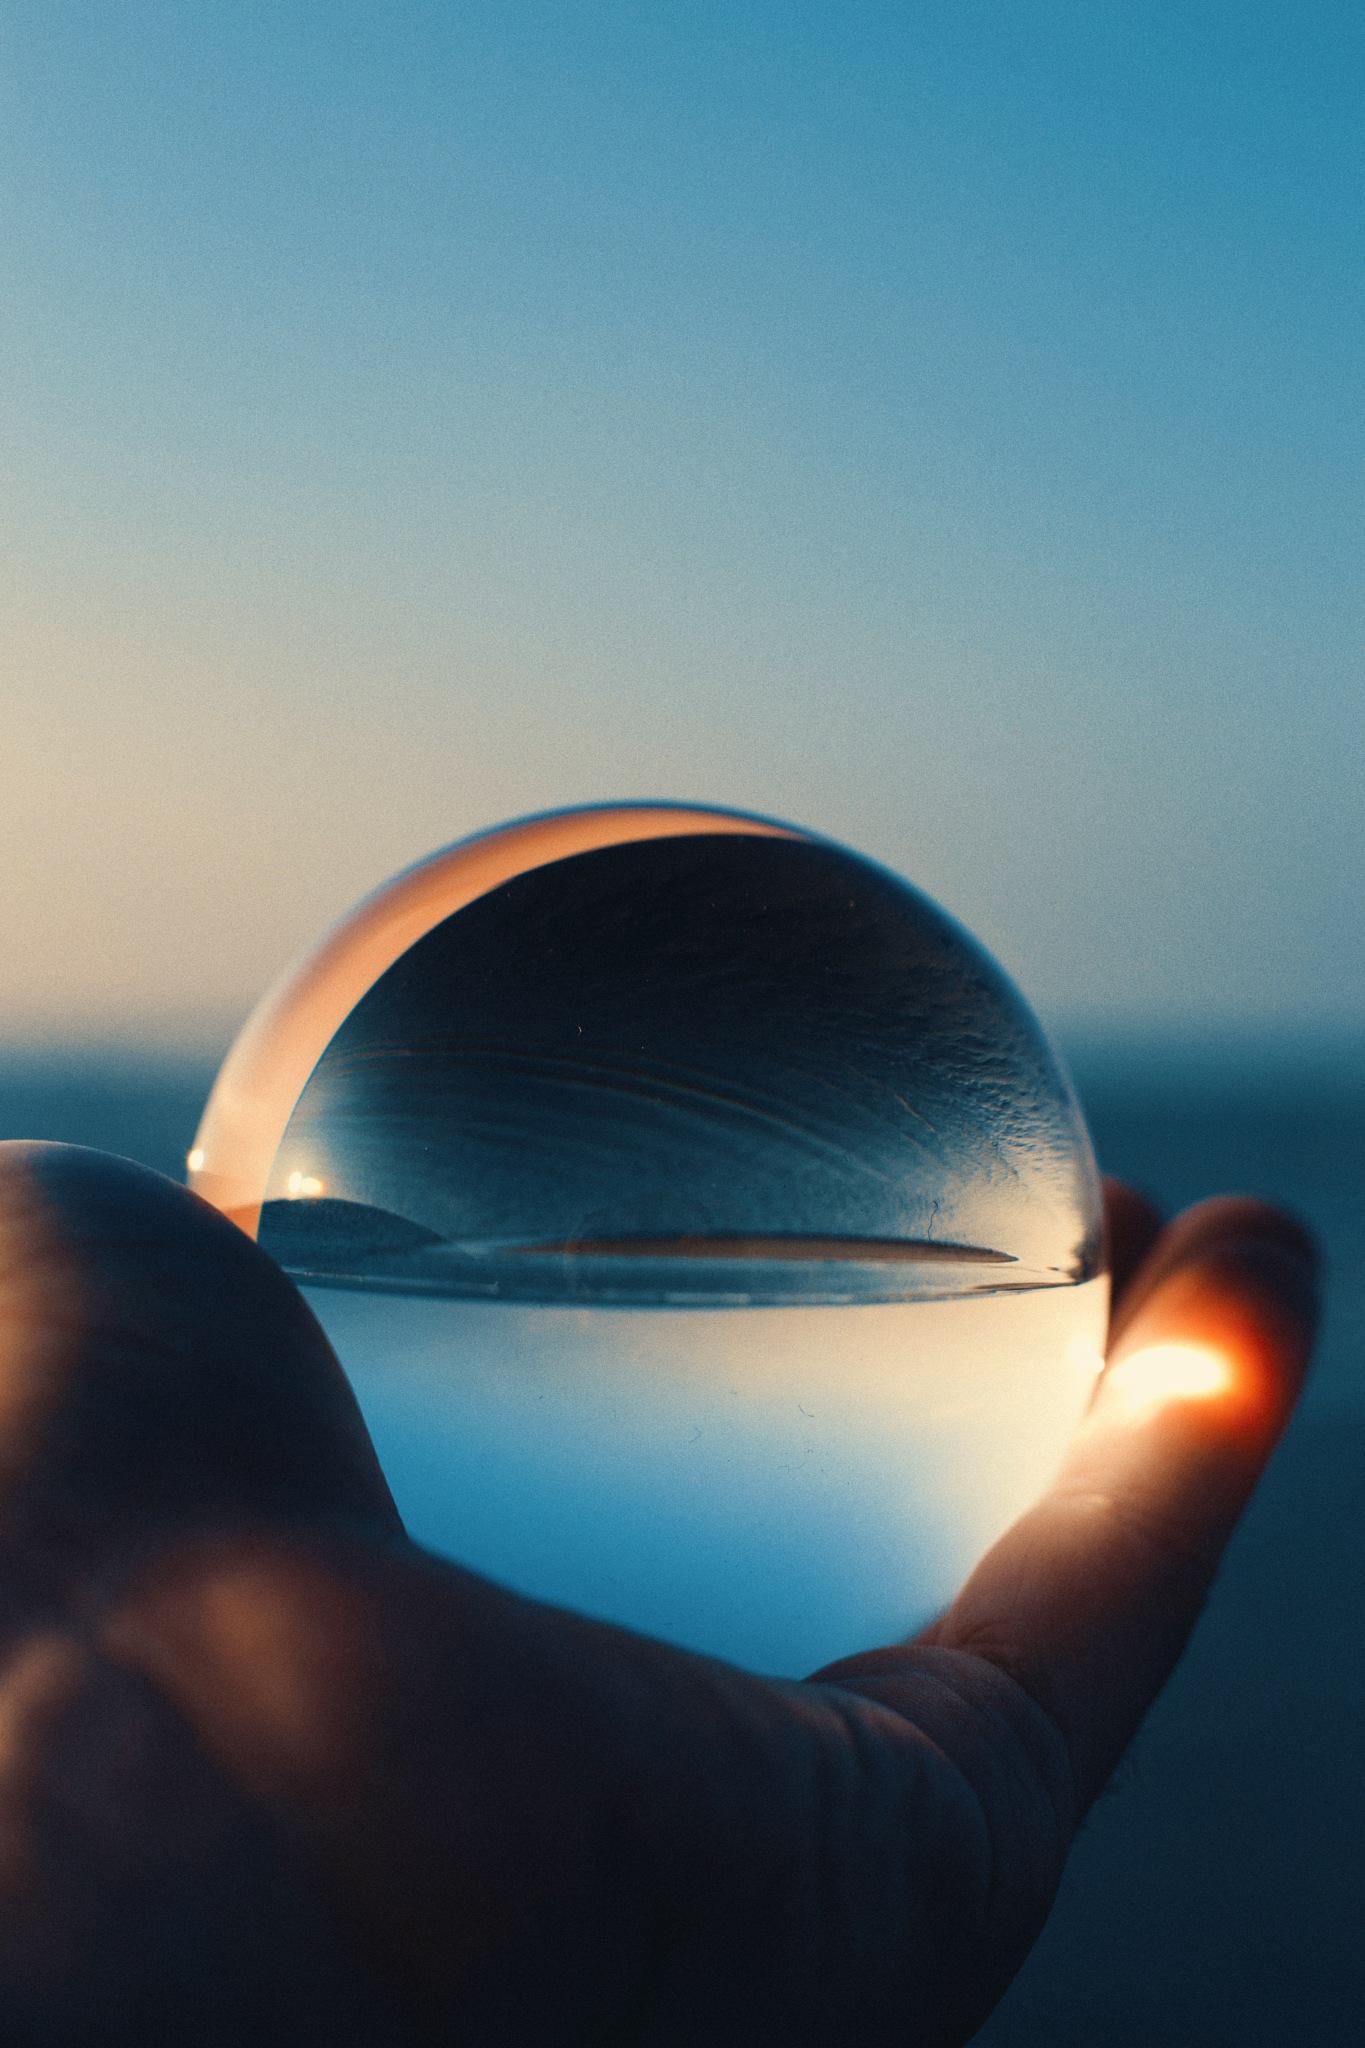 lensball by Anton Naumkin